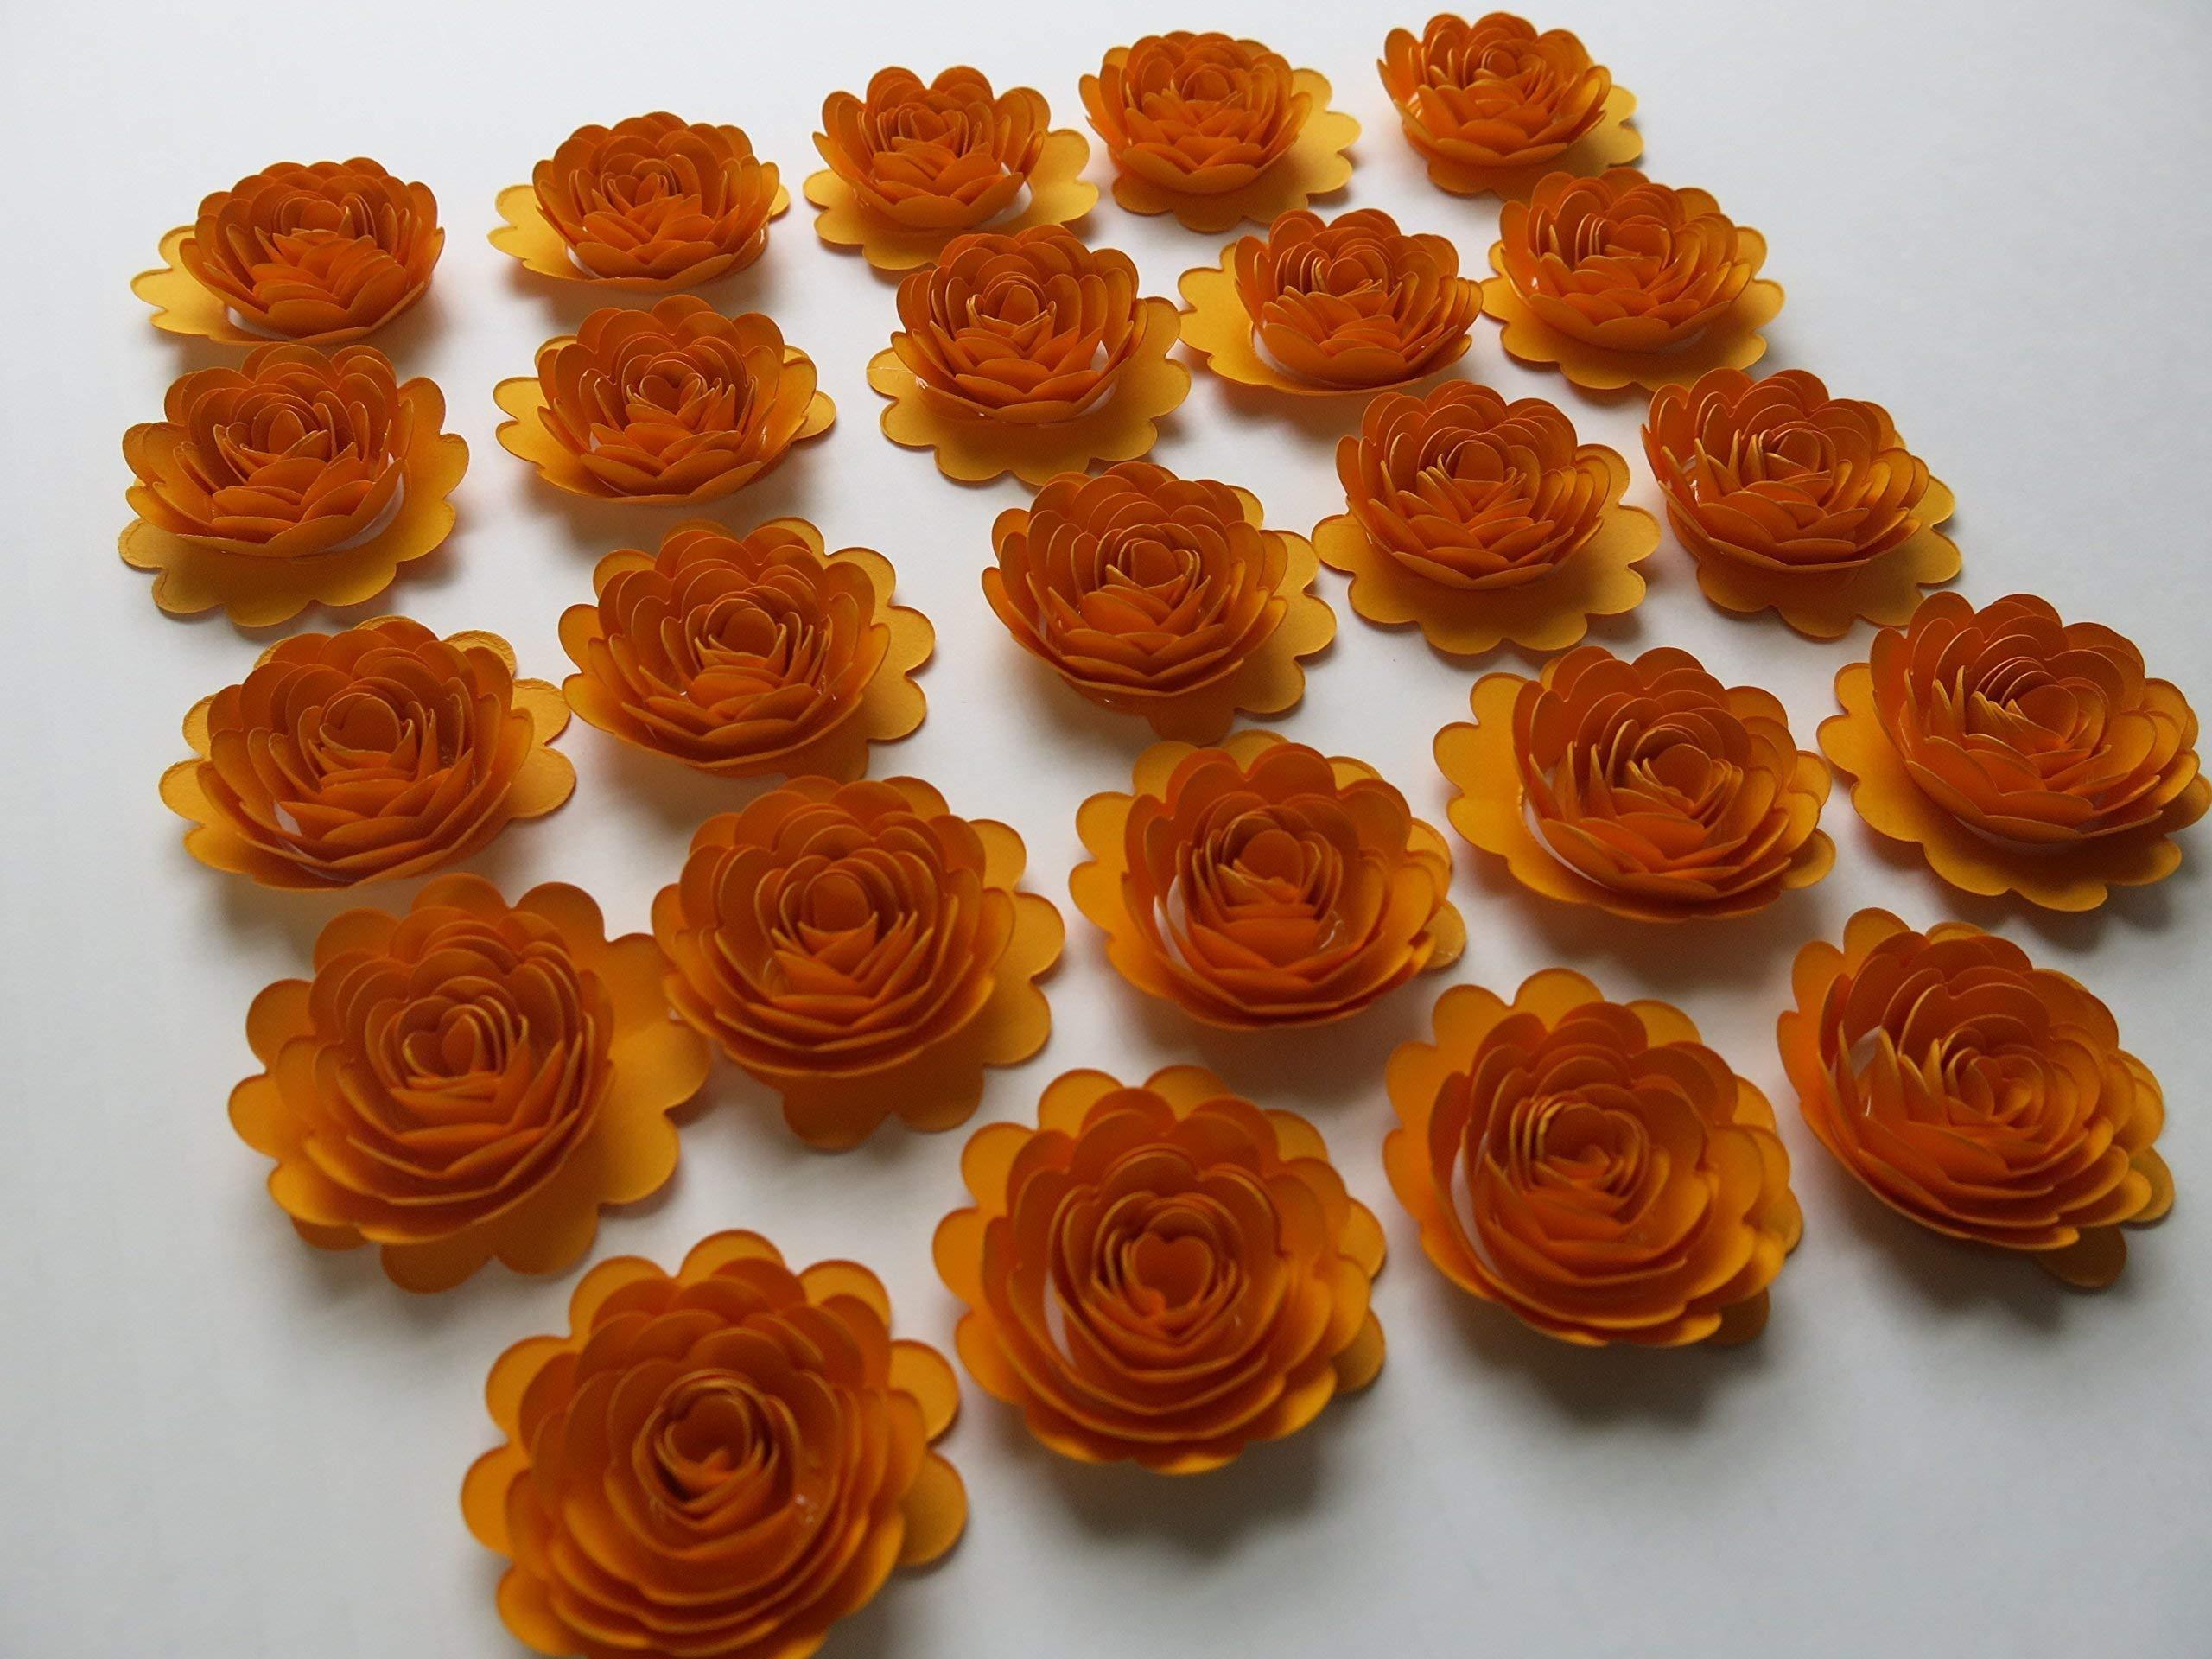 silk flower arrangements 24 gold paper flower carnations 1.5 inch scalloped roses autumn mum thanksgiving dinner table decor